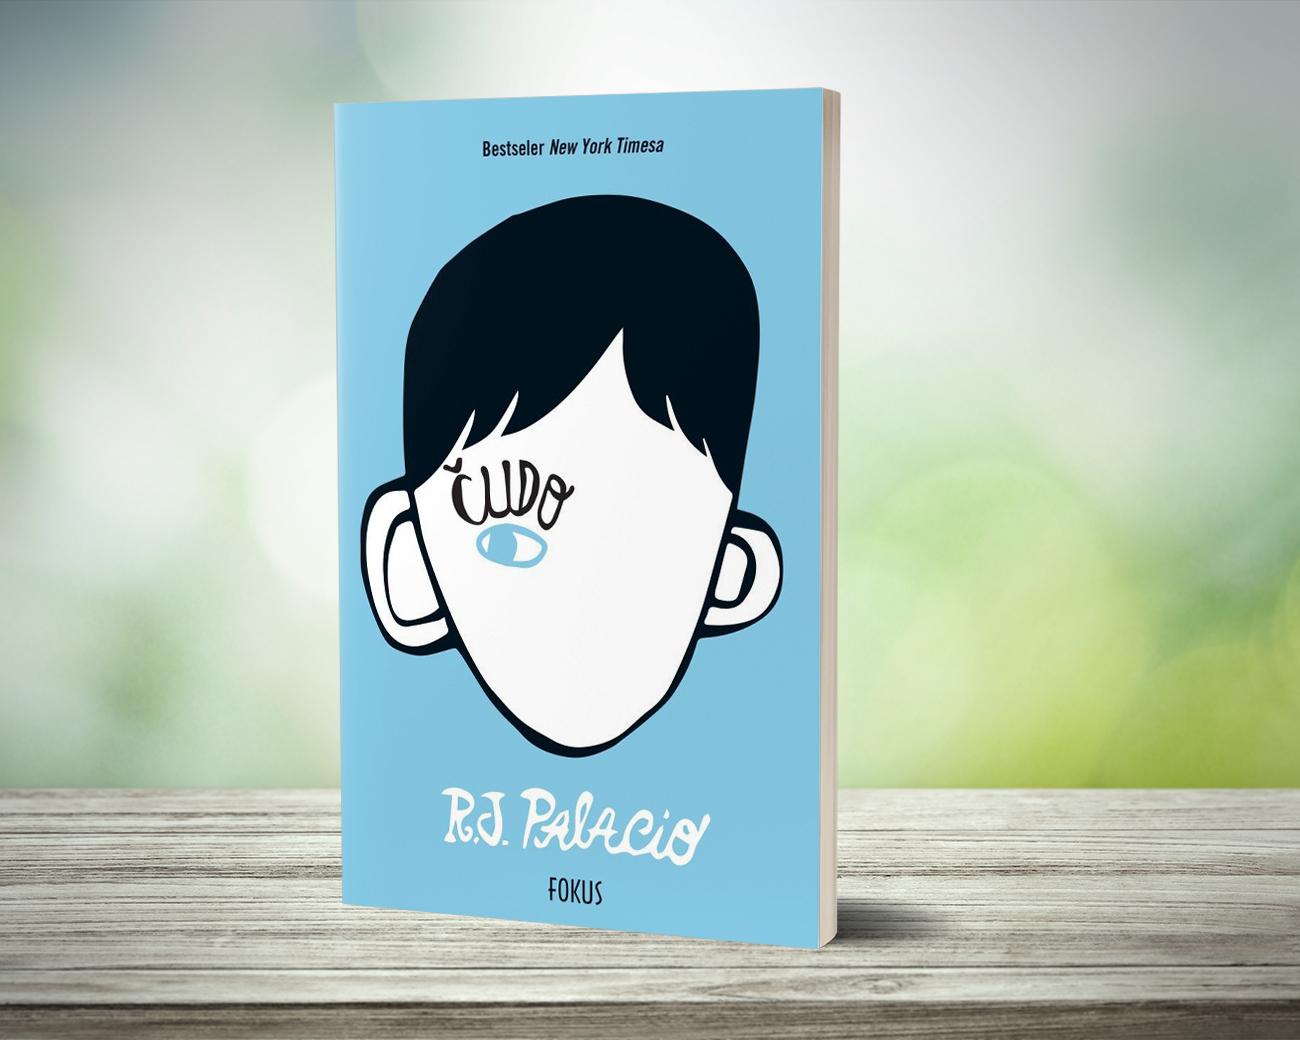 knjiga_za_mlade__cudo